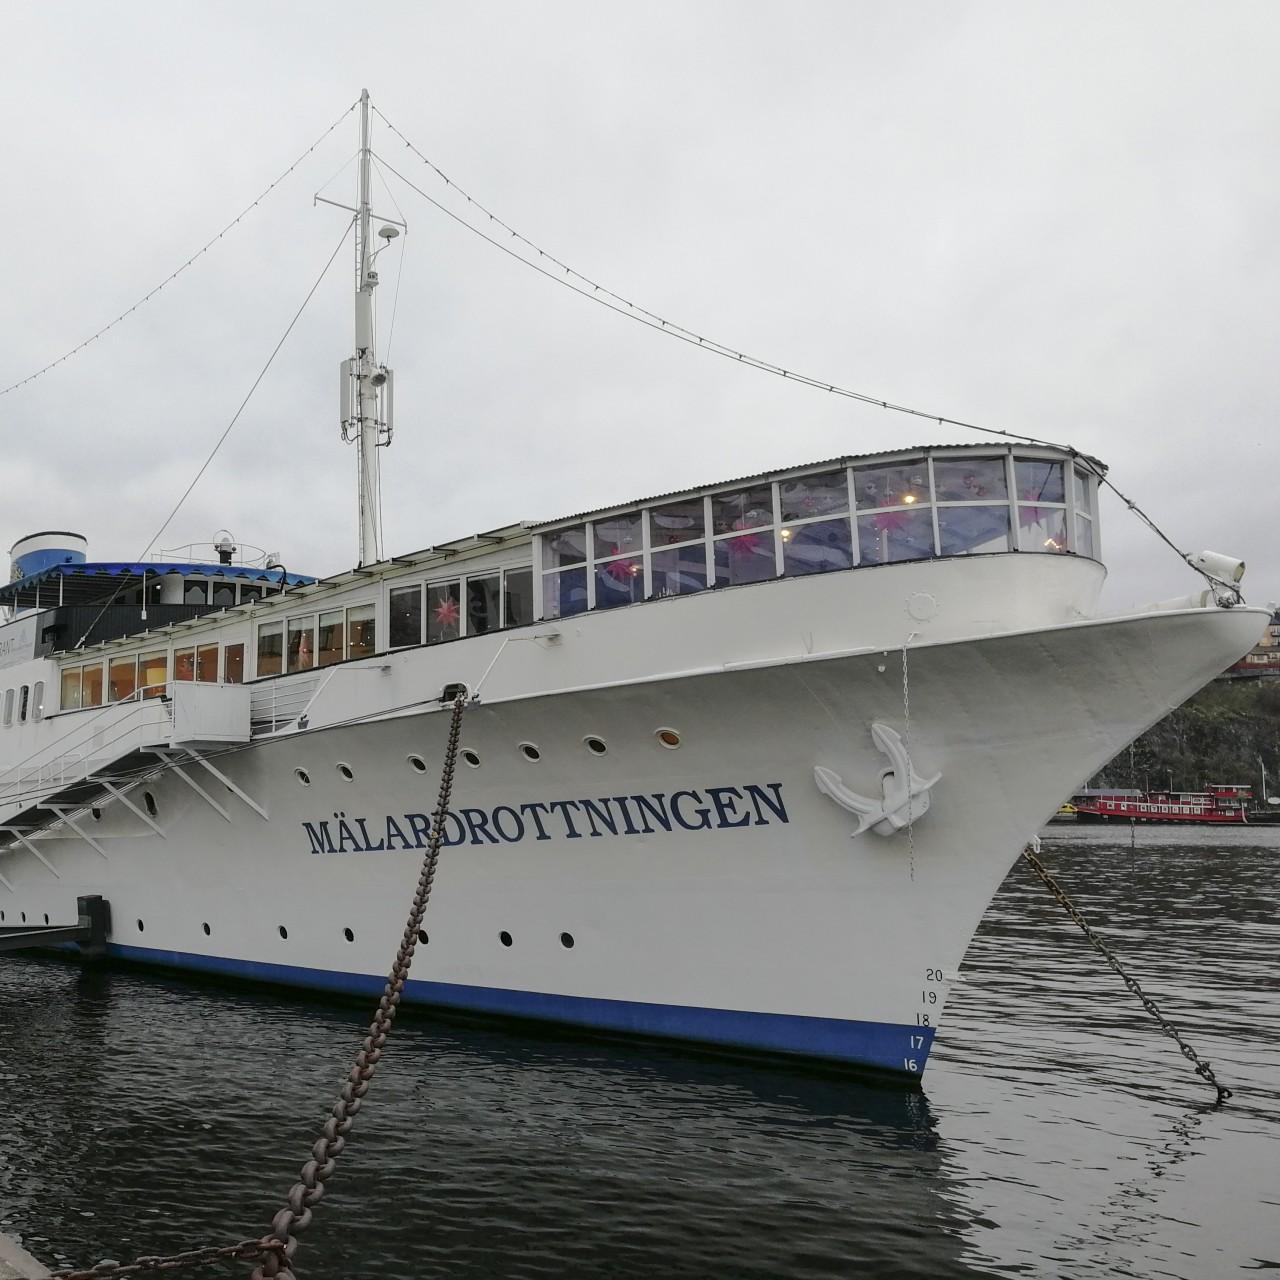 Mälardrottningen: the Stockholm yacht hotel once owned by American